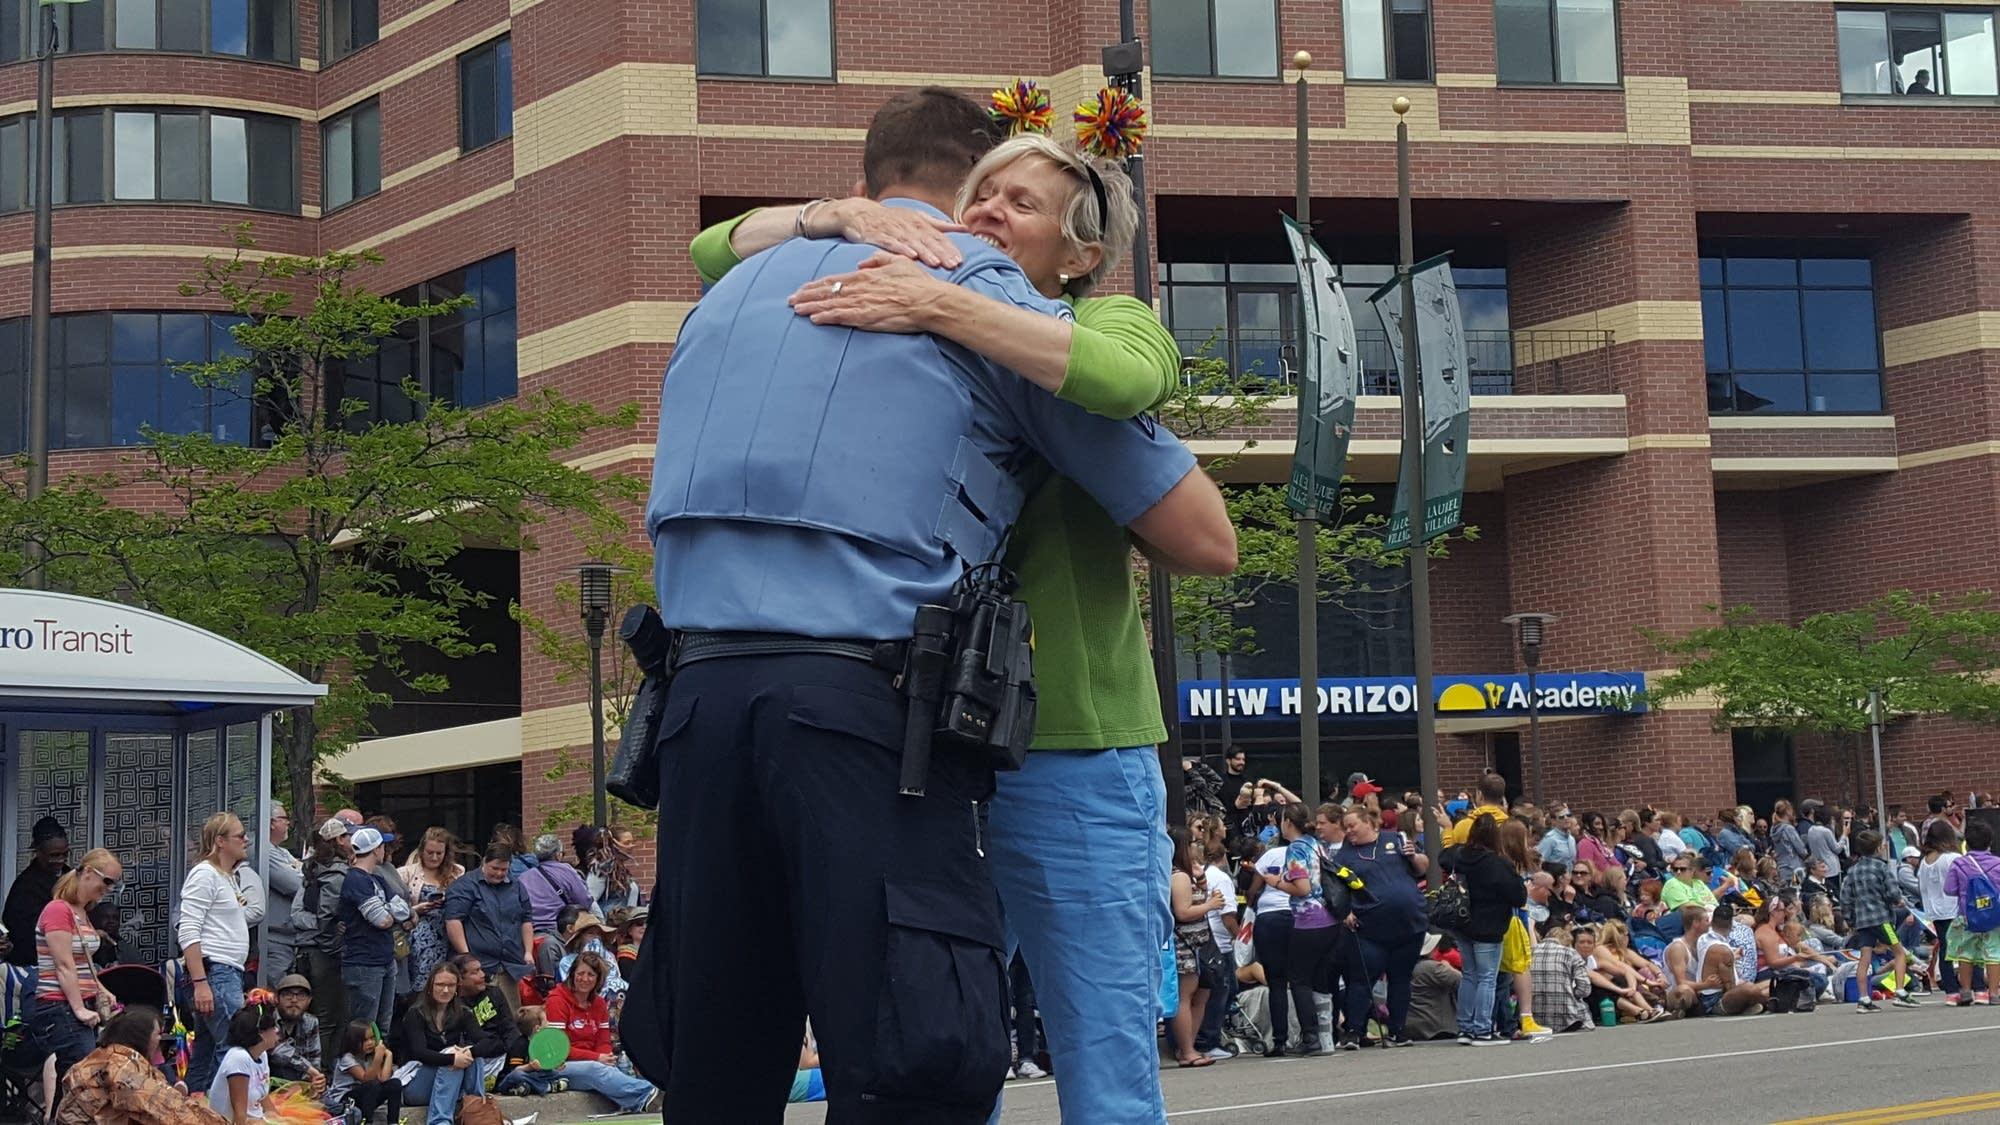 A Pride attendee hugs Minneapolis Polcie Sgt. Deitan Dubuc.